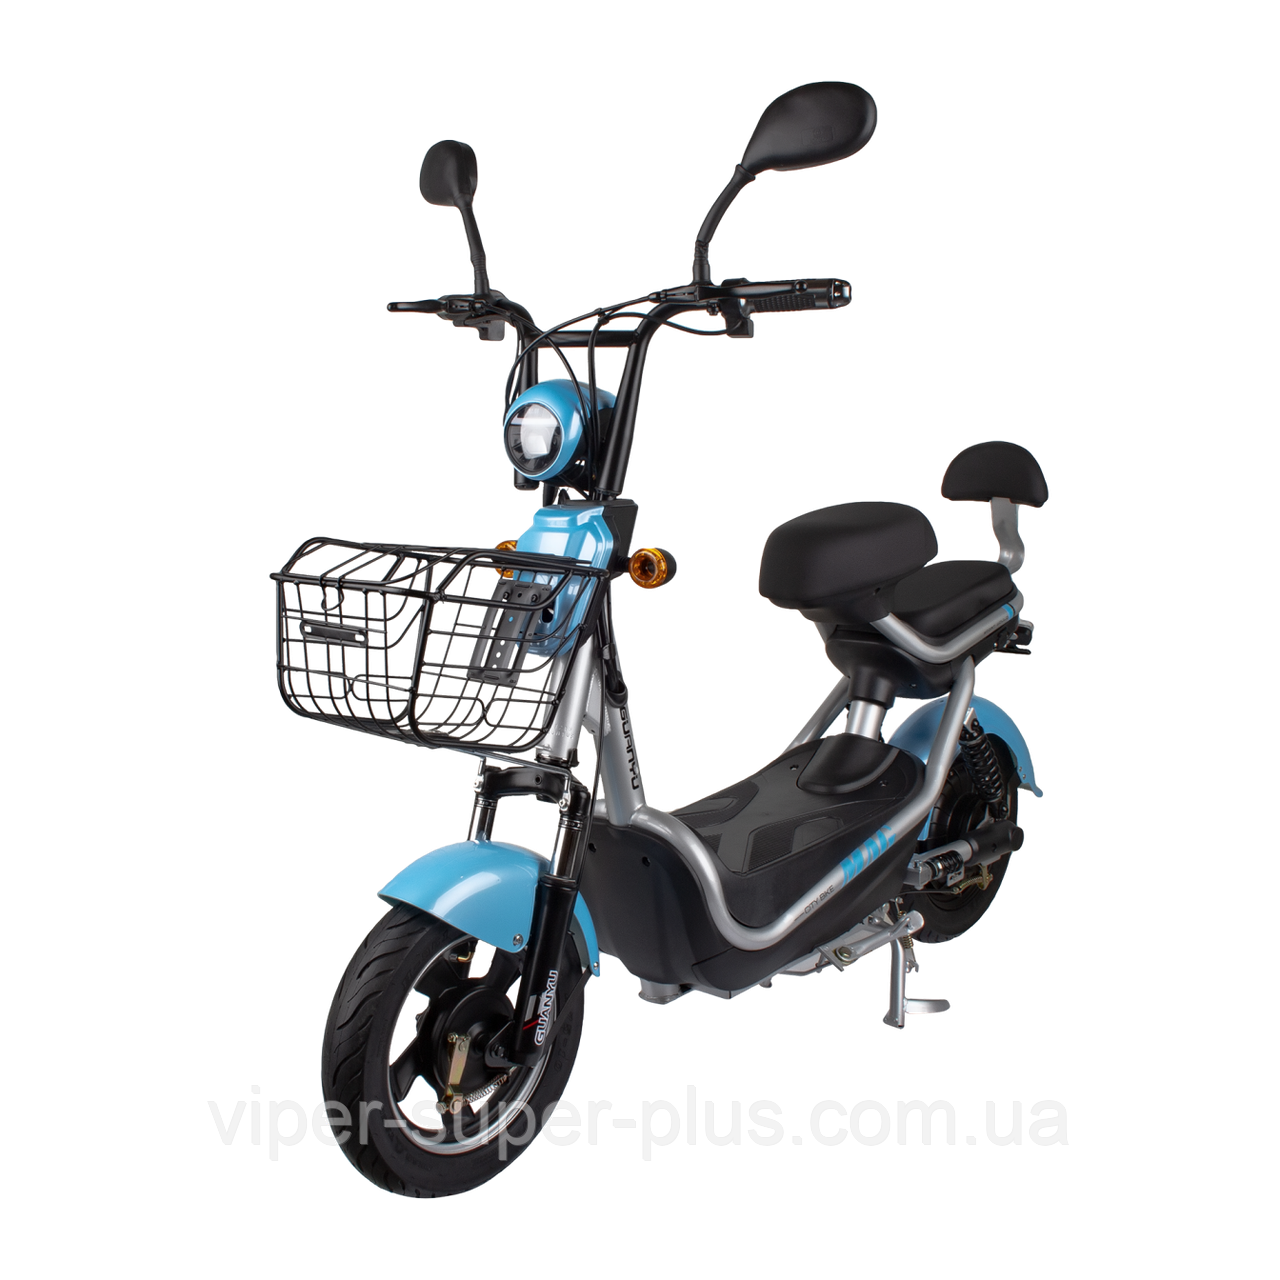 Электрический скутер CITY 350W/48V Серо-голубой